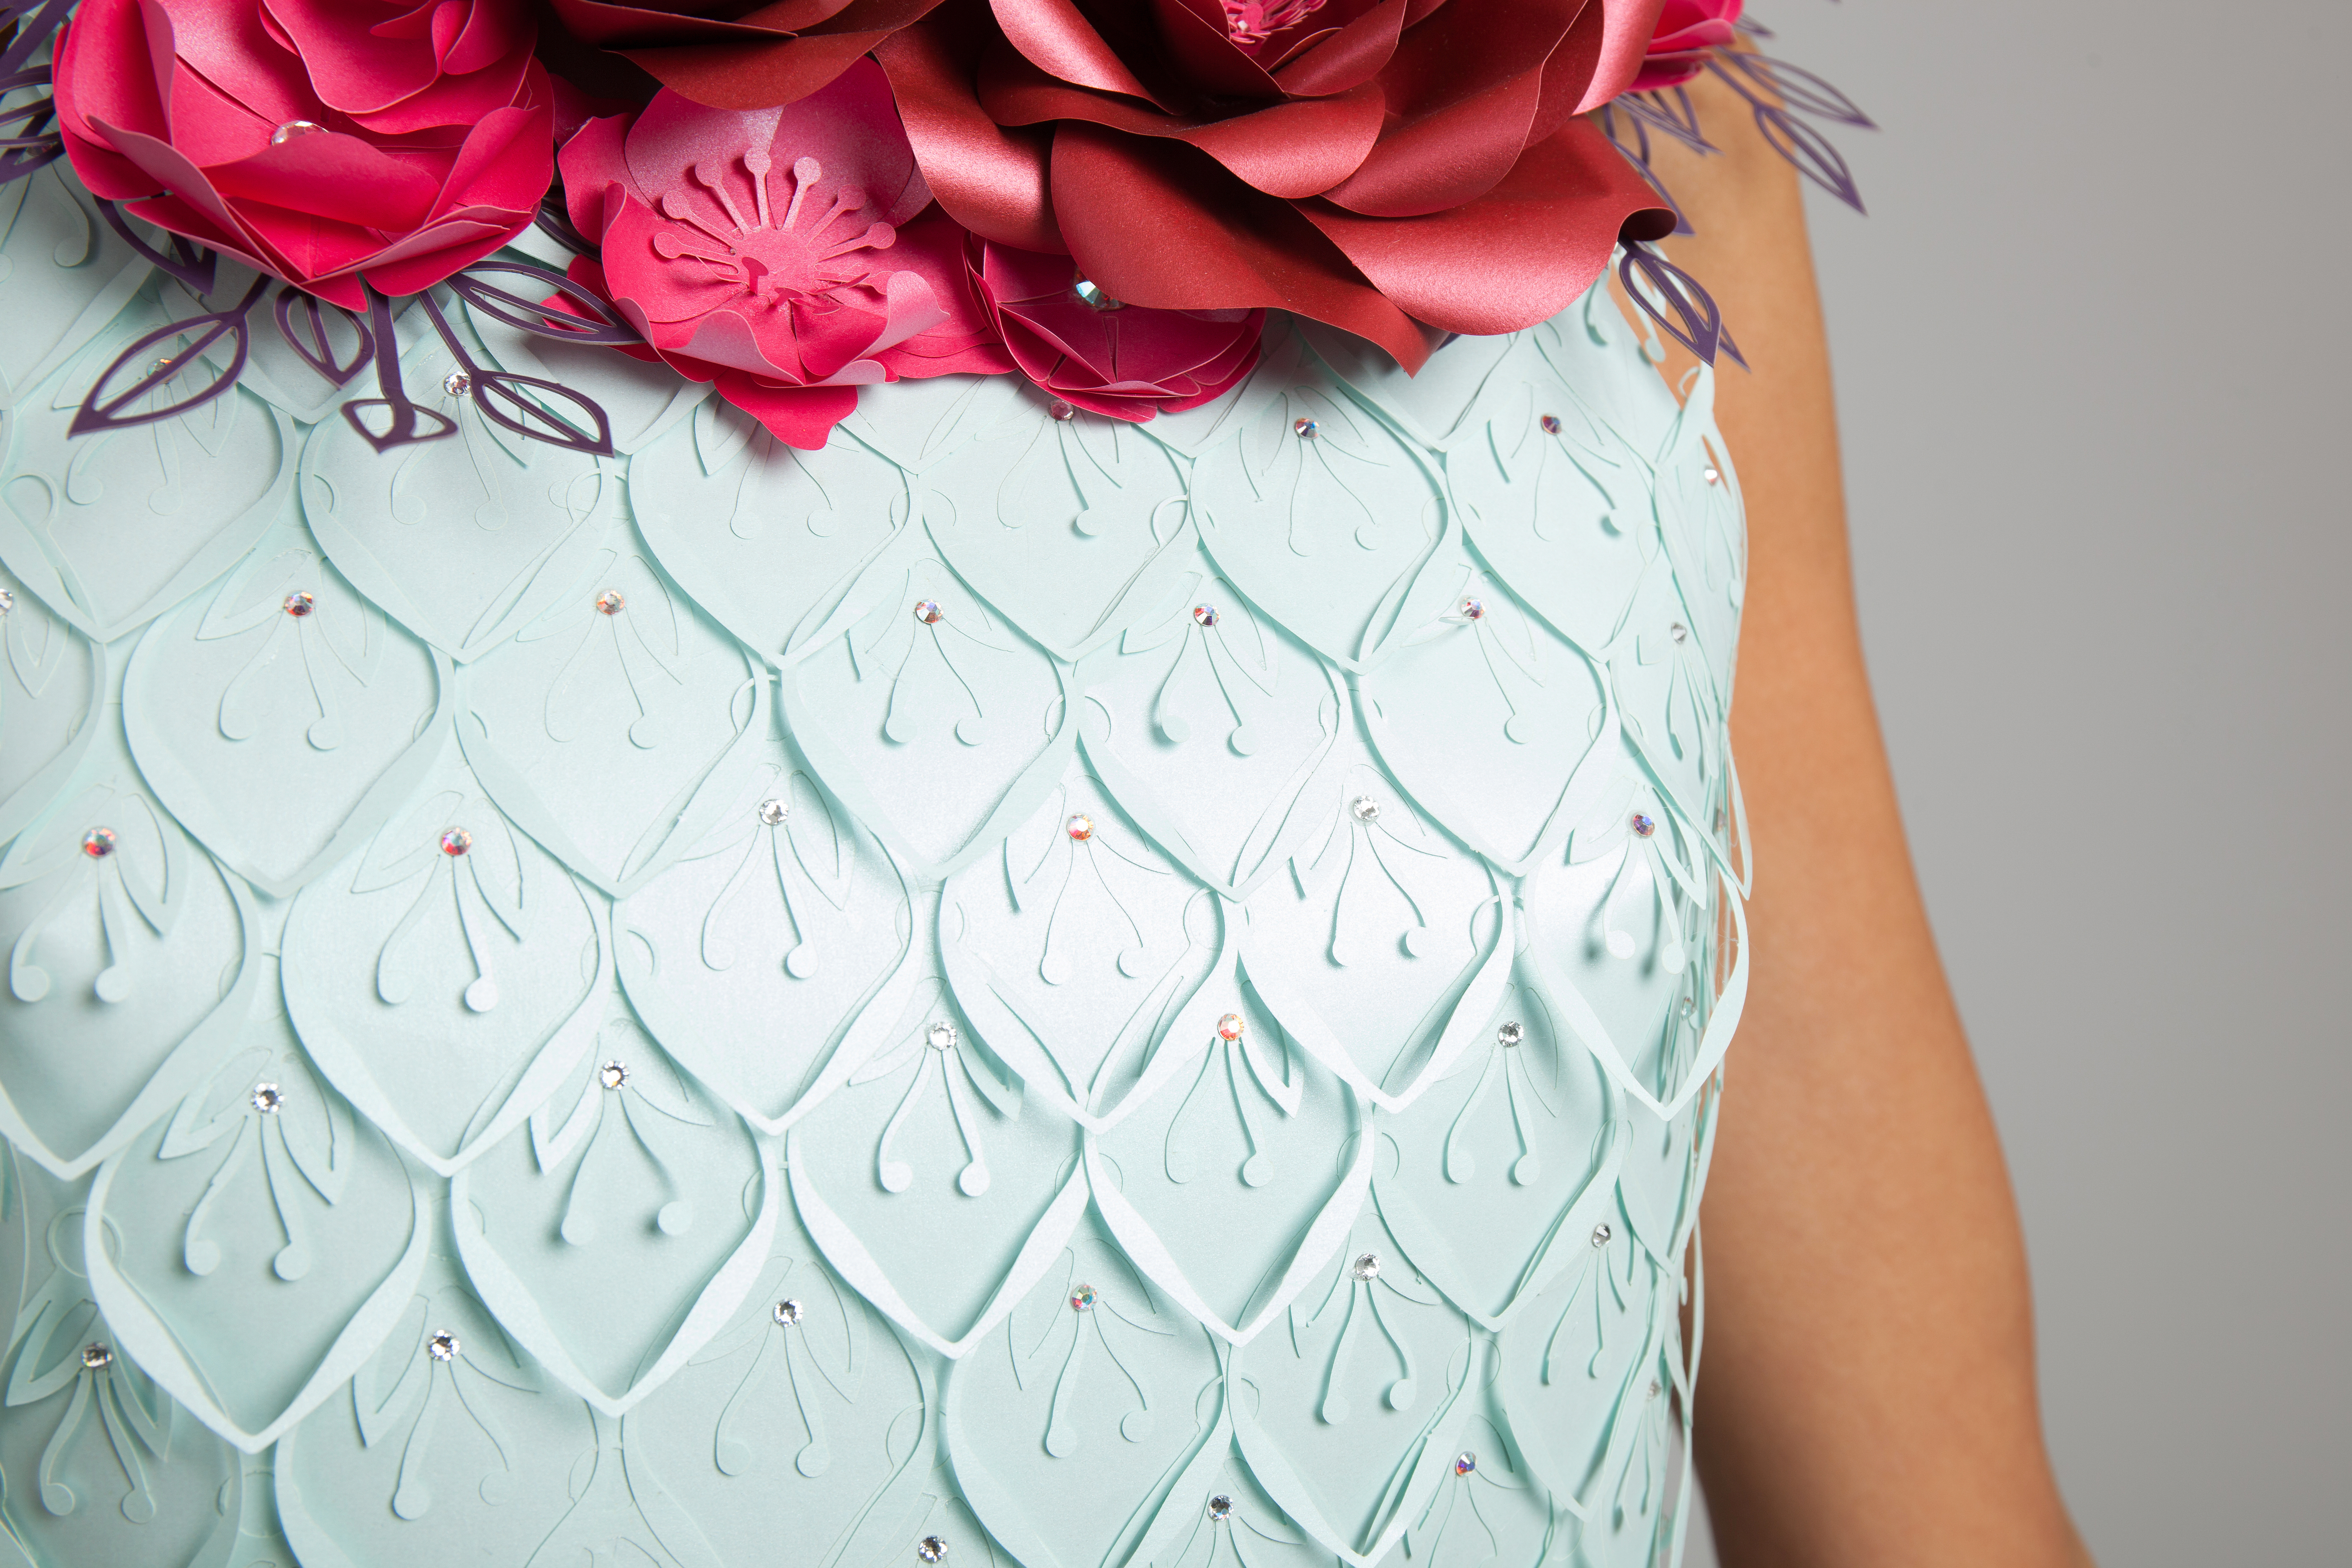 paper flowers dress details